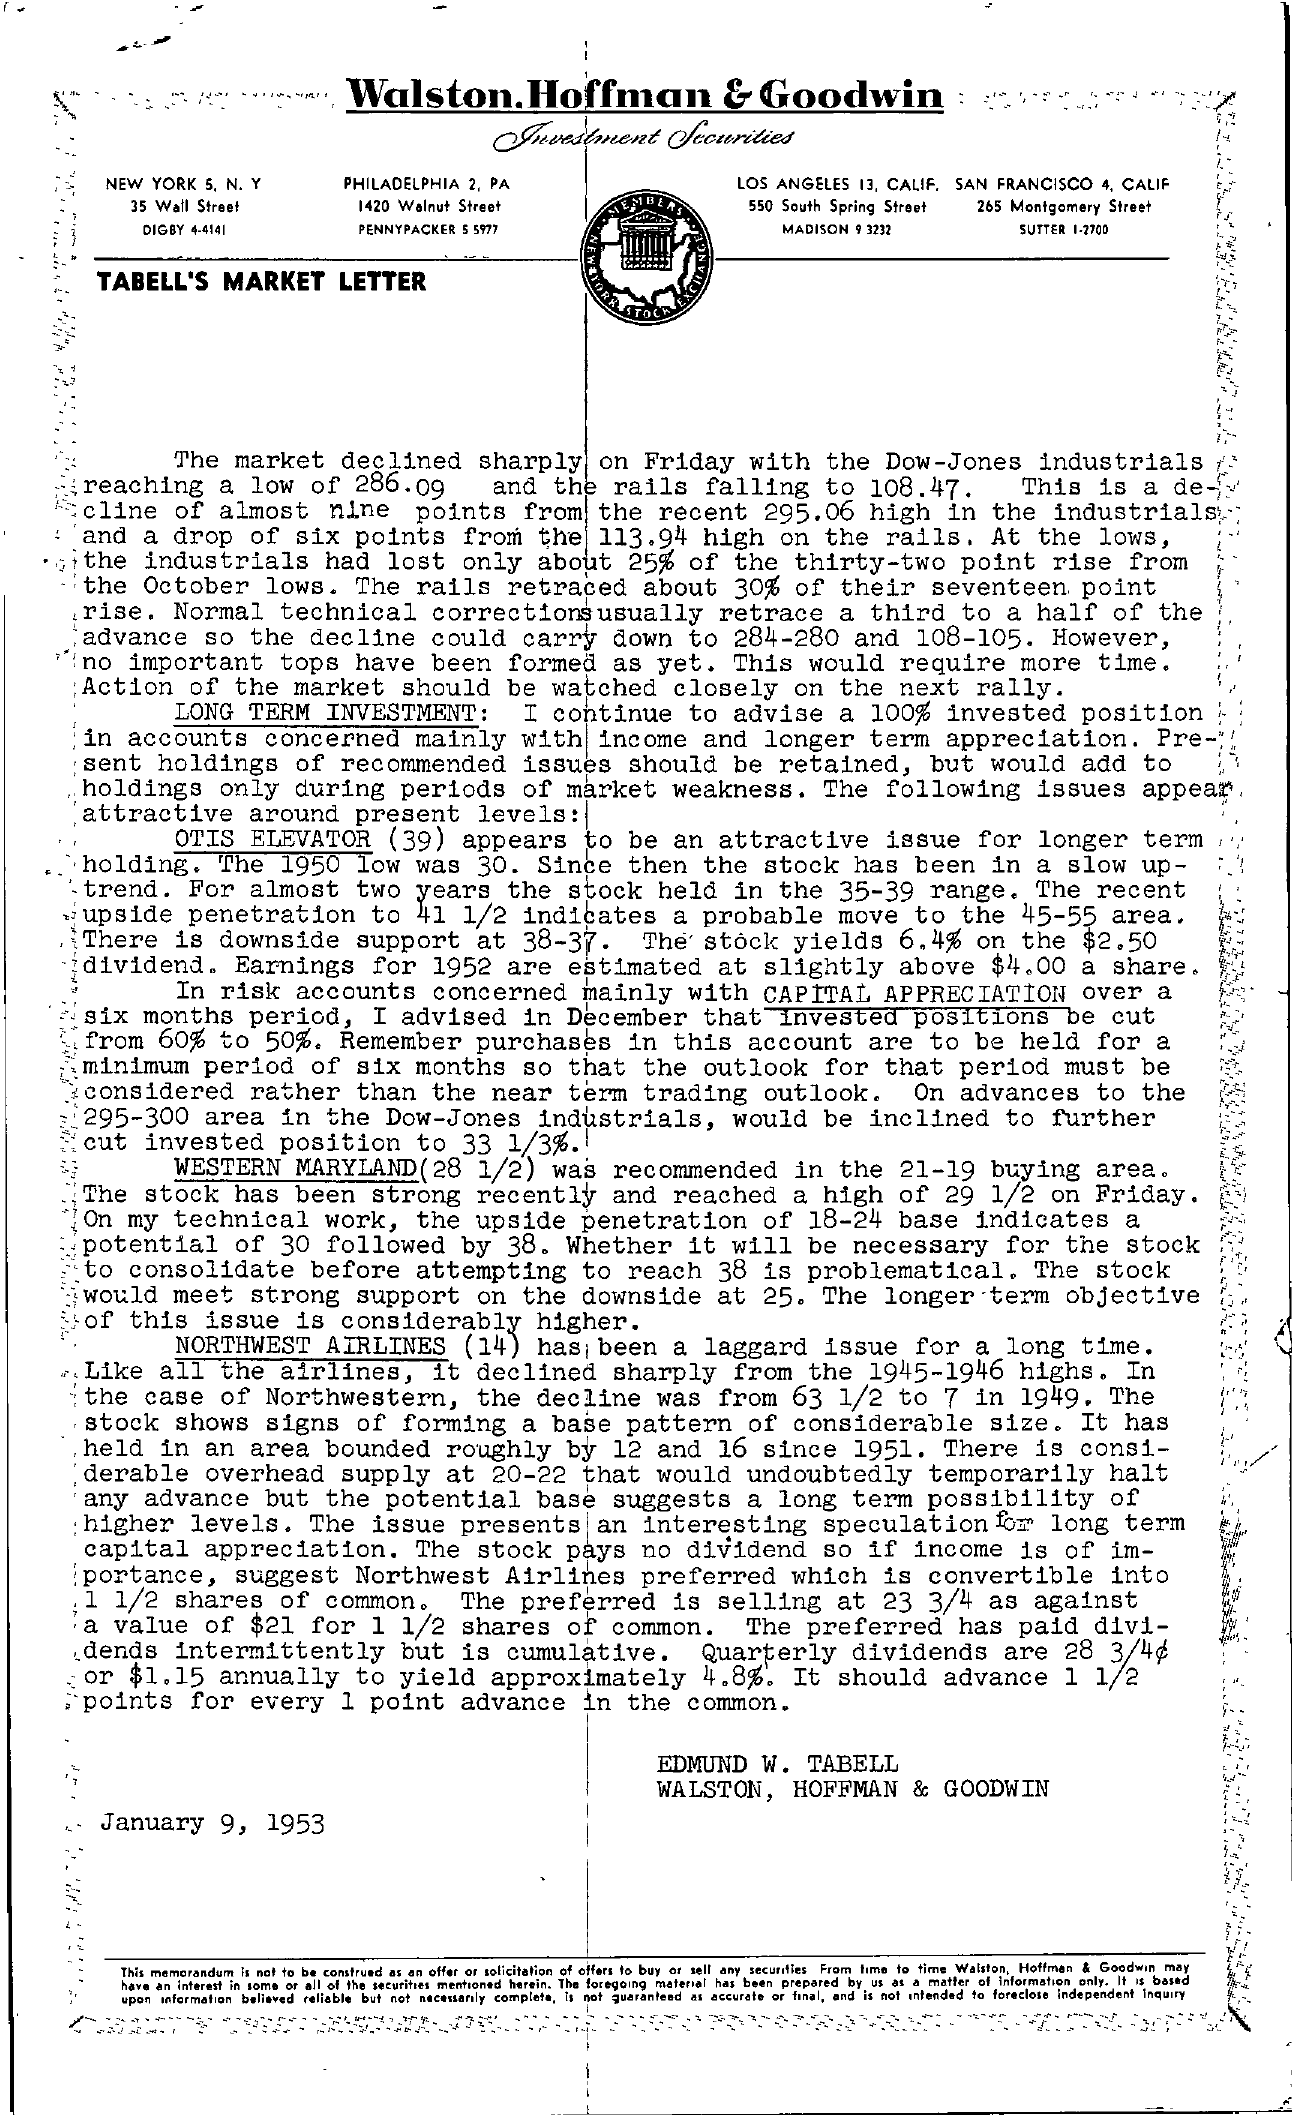 Tabell's Market Letter - January 09, 1953